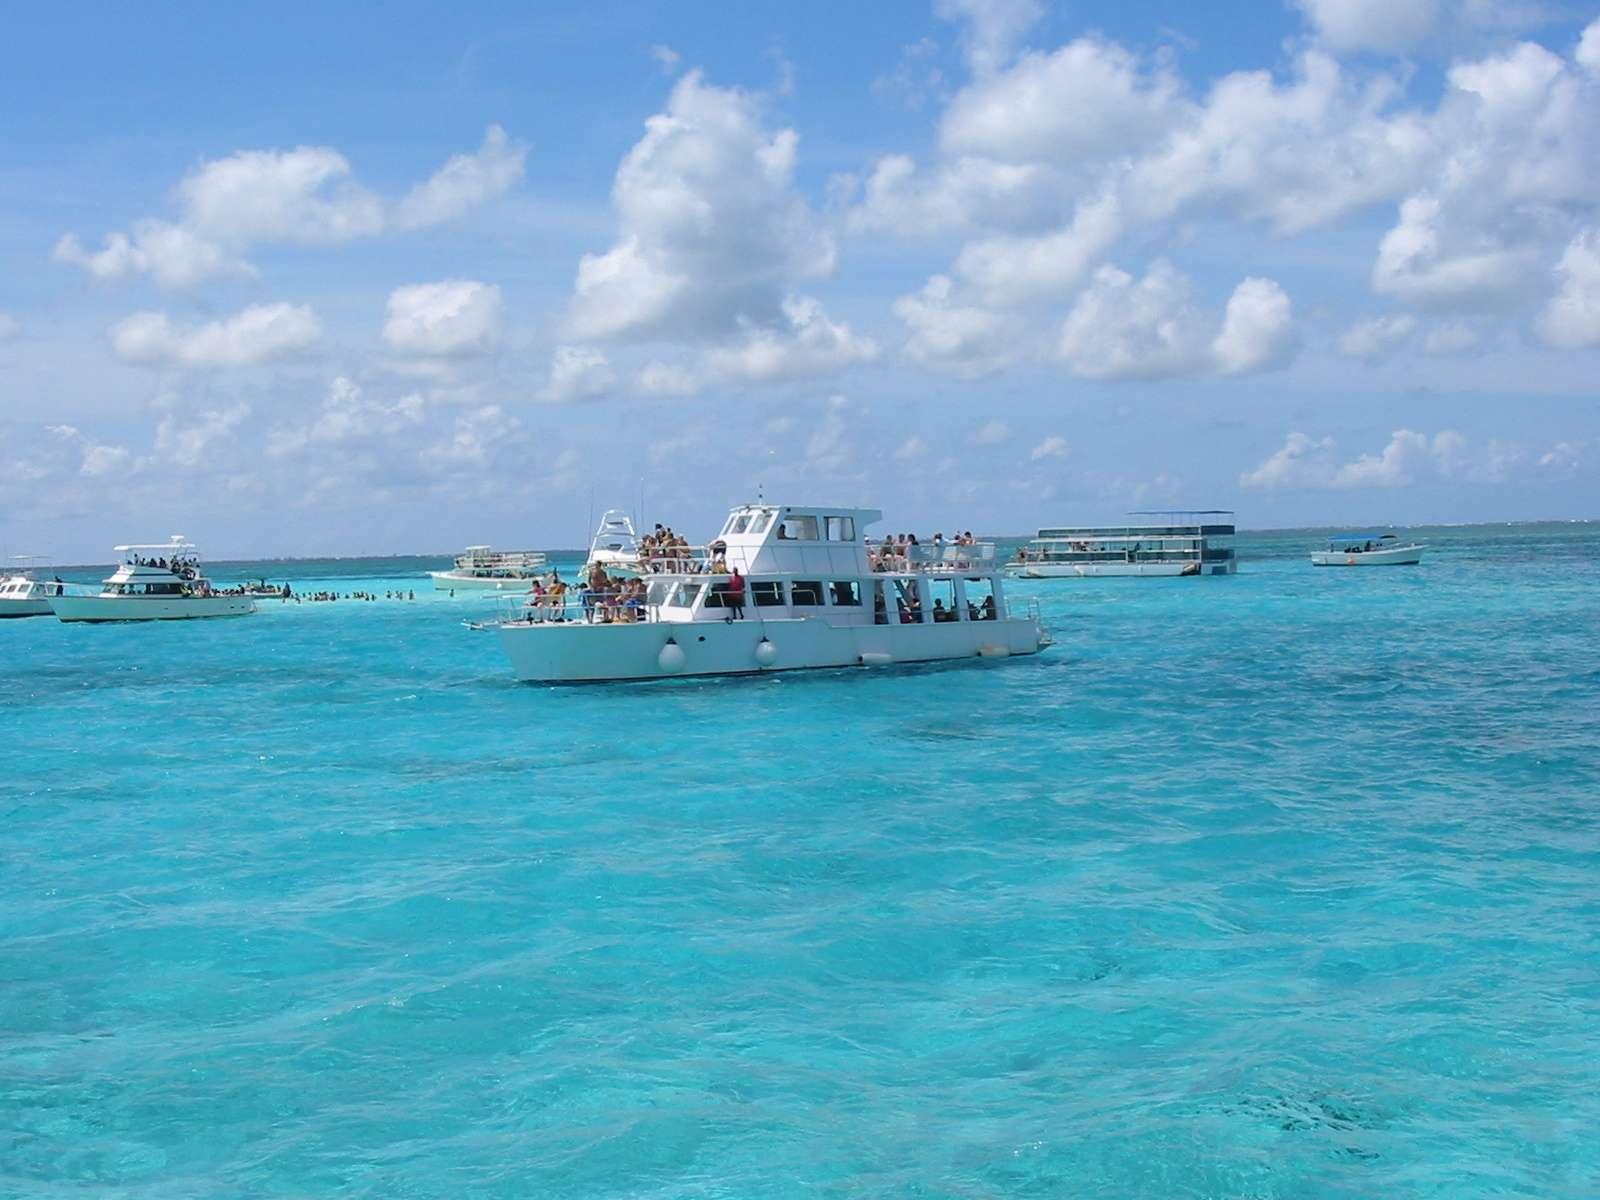 snorkeling cayman islands wallpaper HD 1600x1200